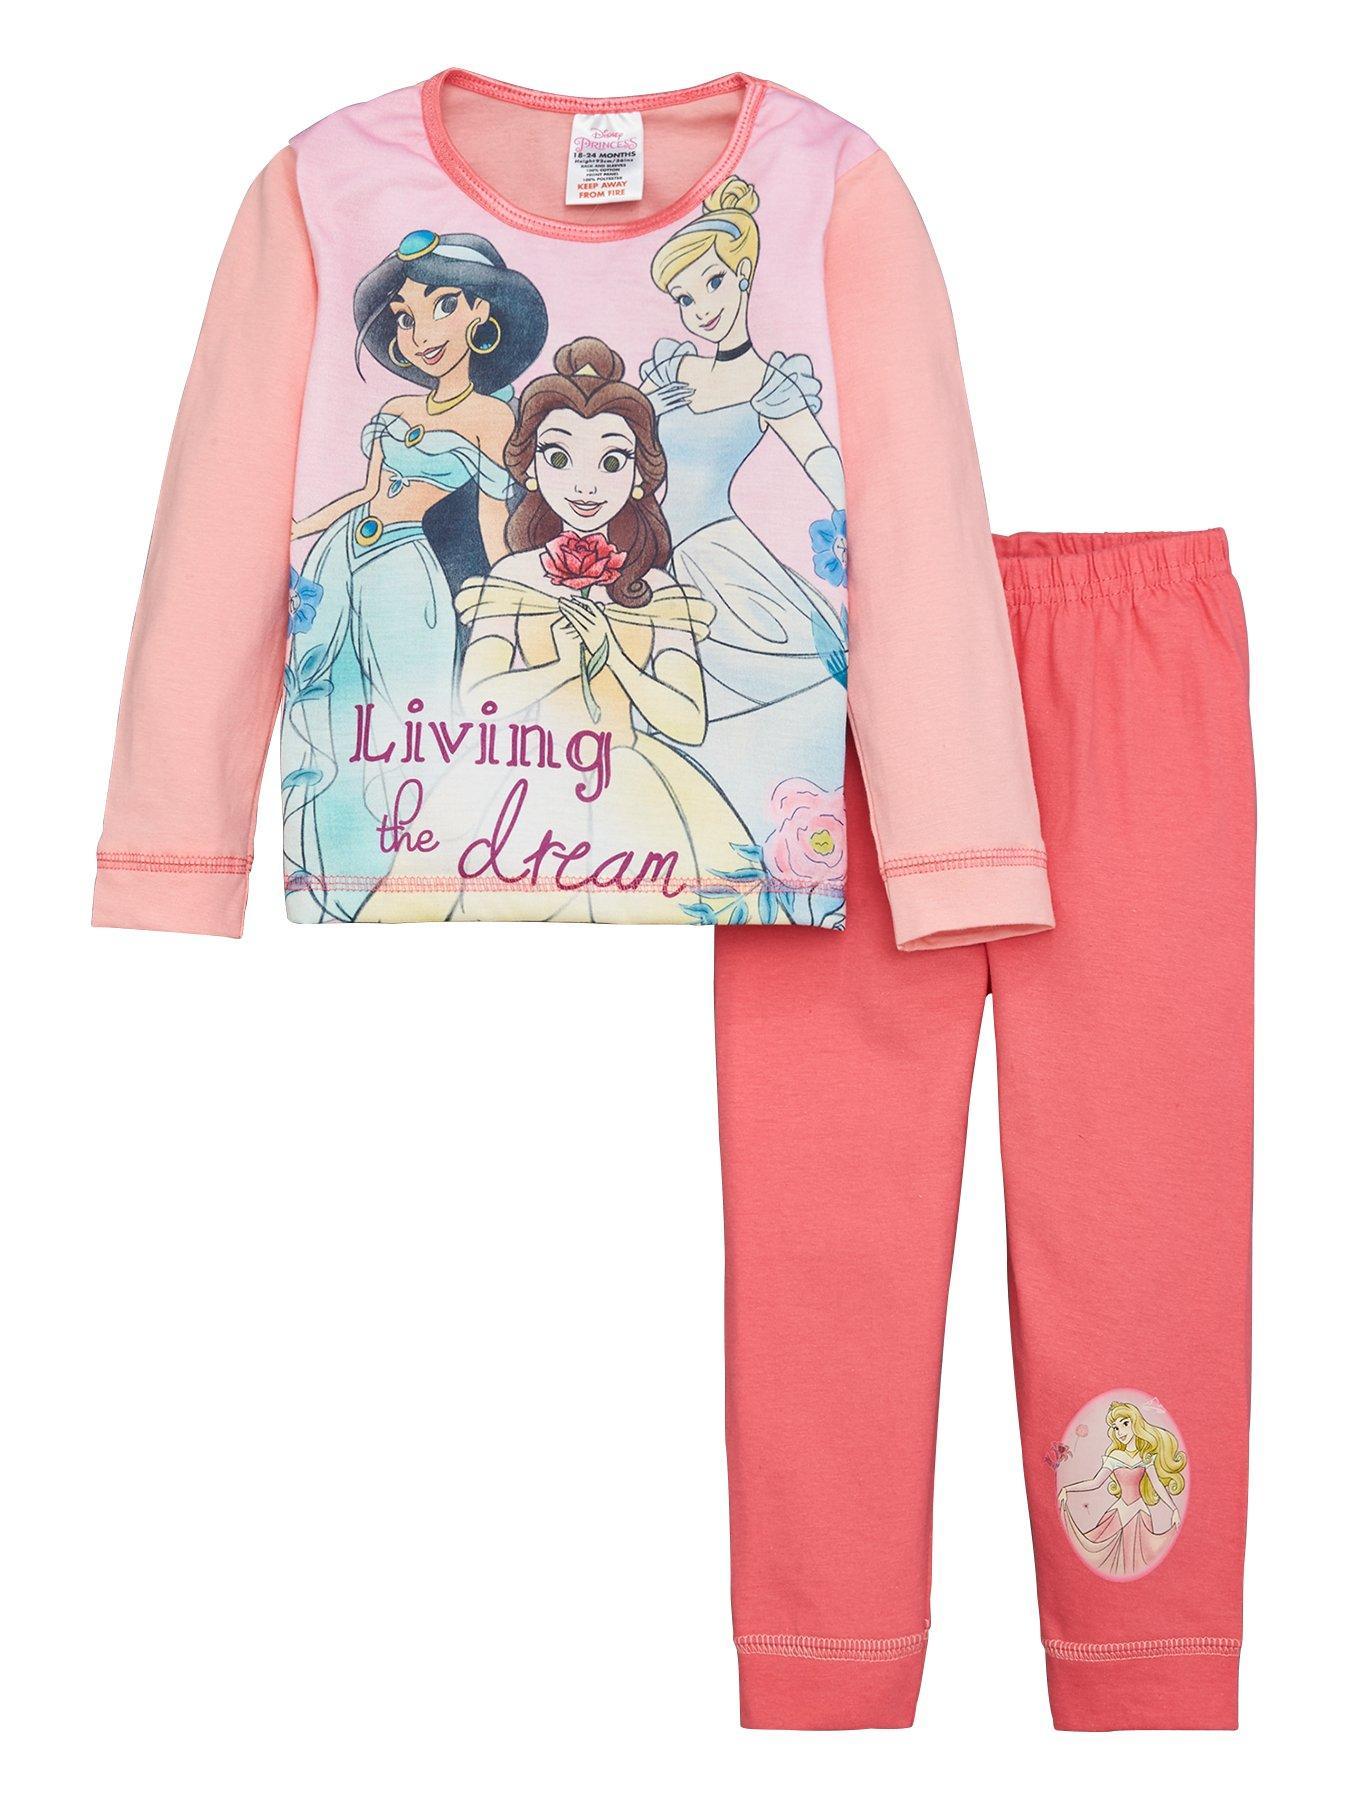 Disney Aladdin PyjamasGirls Princess Jasmine Pyjama SetKids Disney PJs